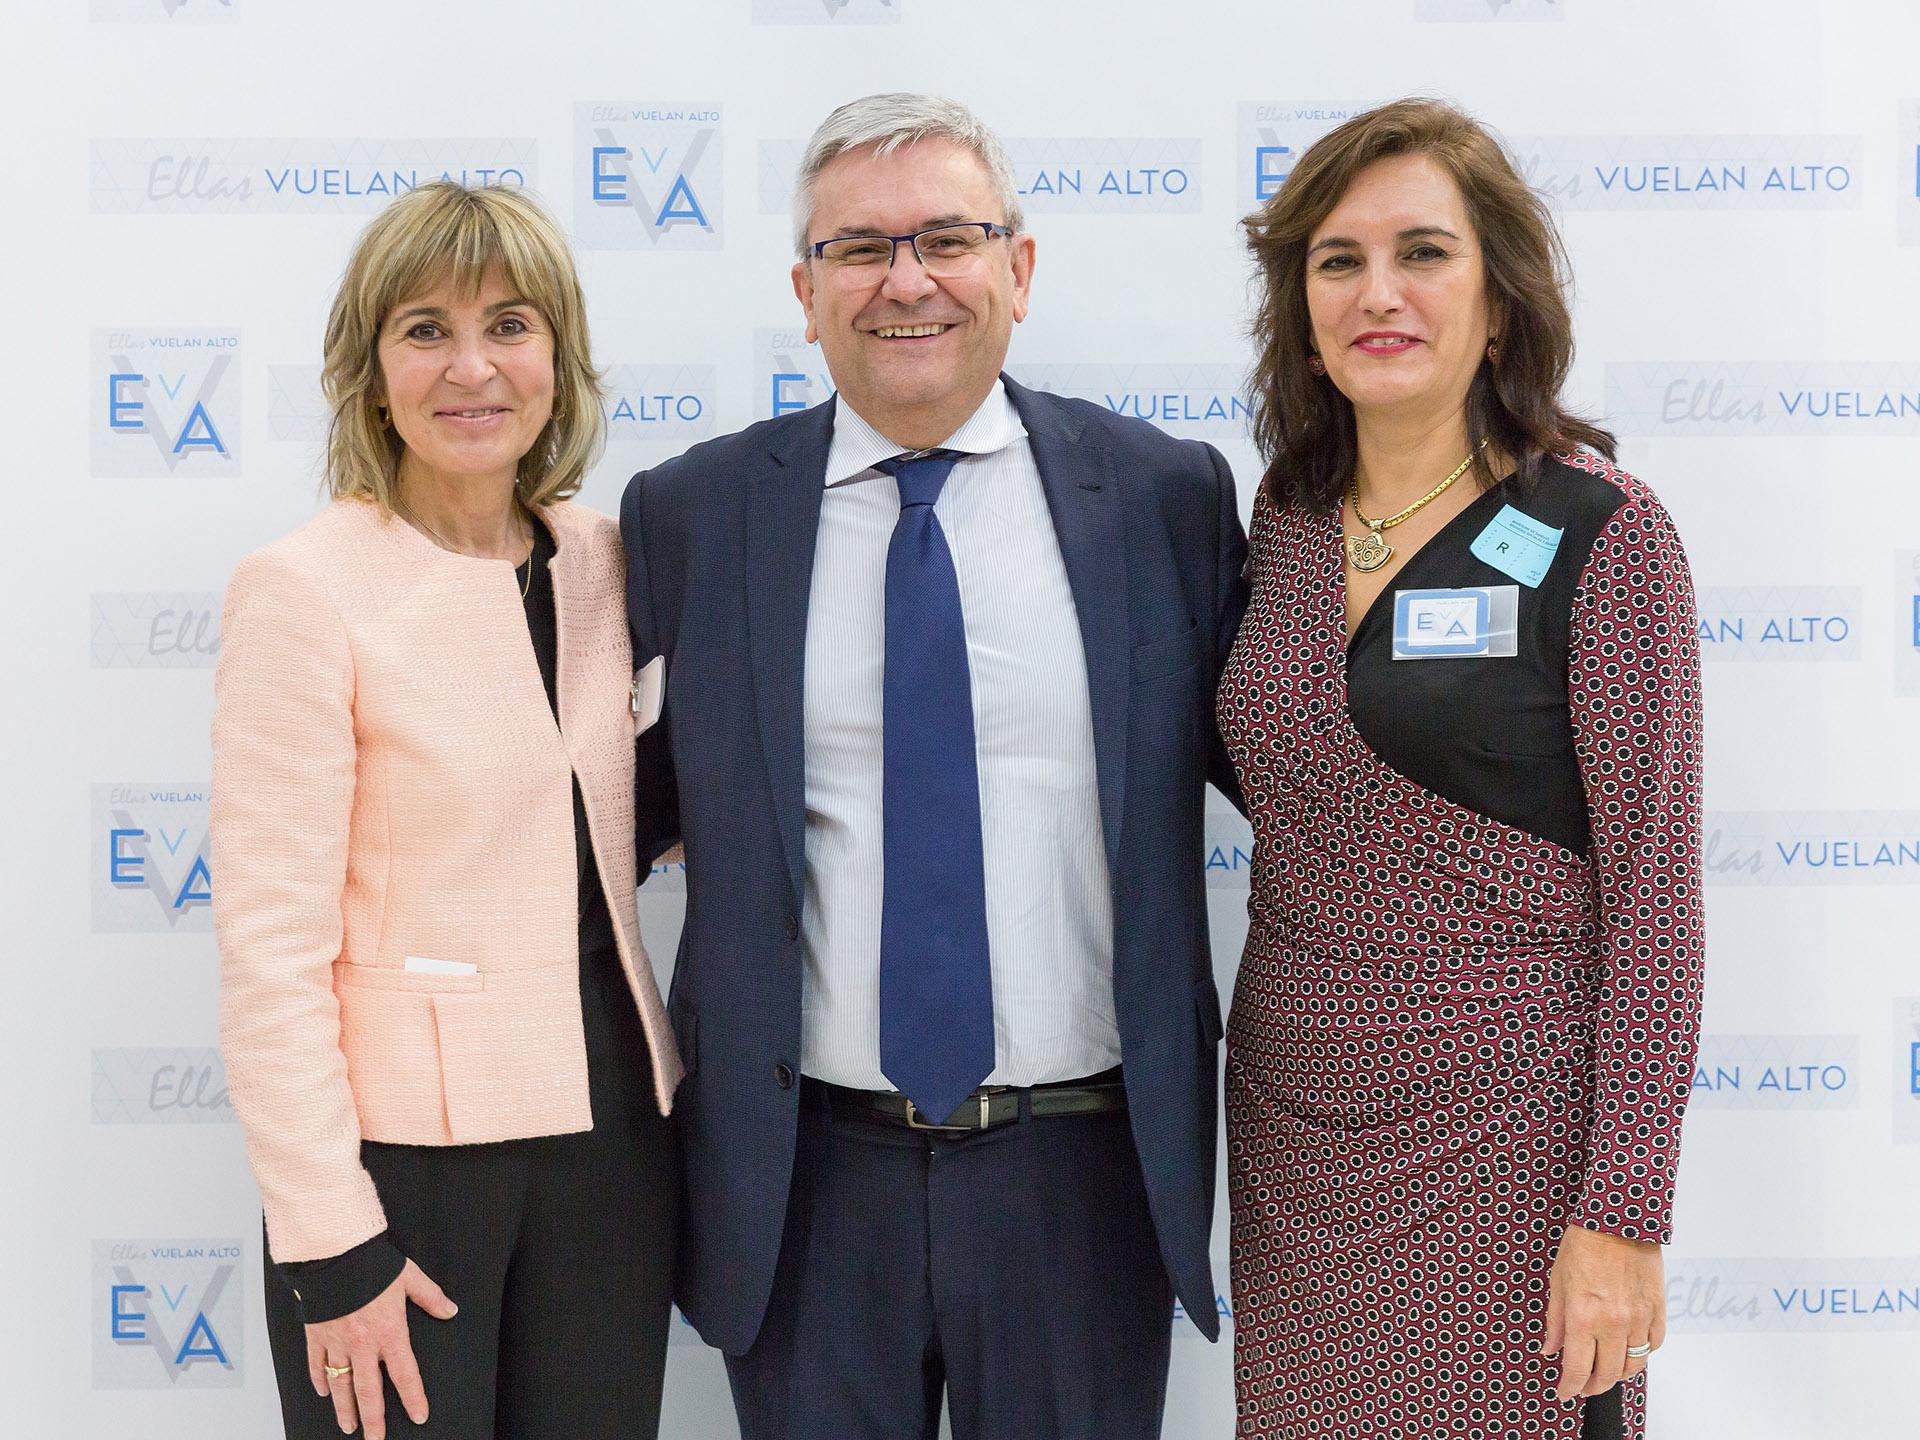 En el centro Manuel Huertas, presidente de Airbus Operations España, con Teresa Busto e Isabel Maestre, vicepresidenta de EVA.